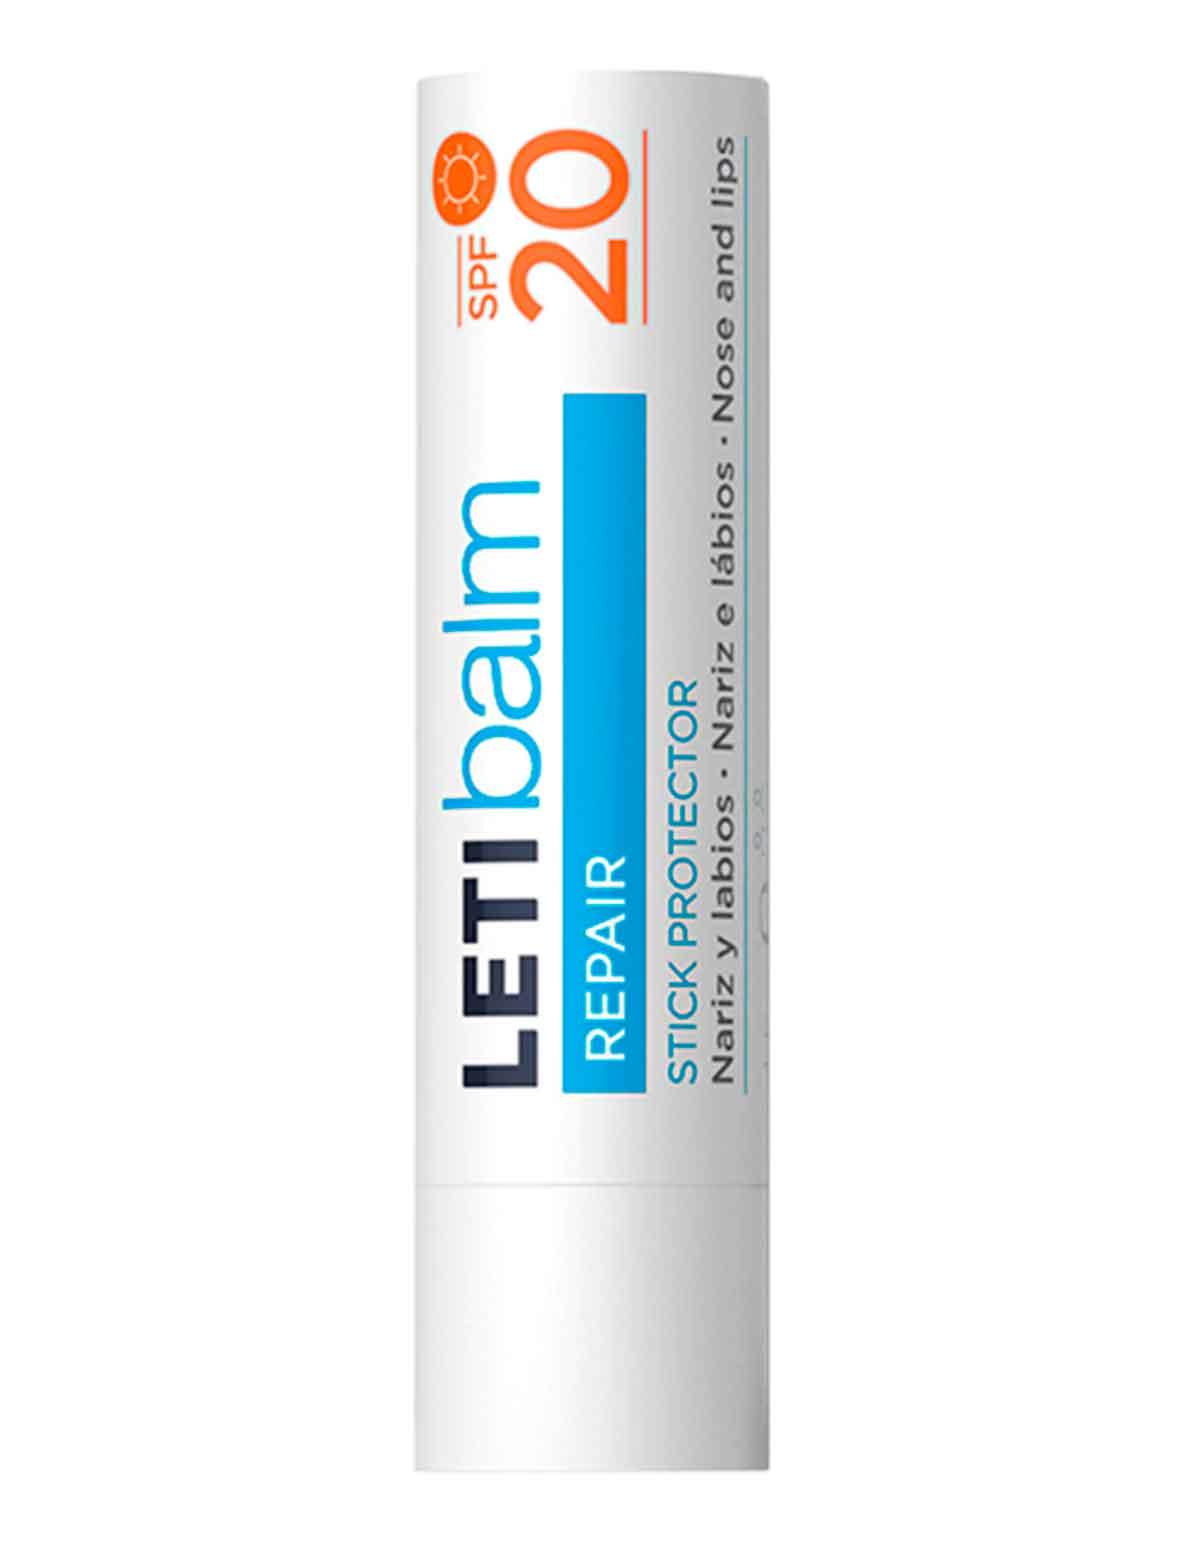 Stick protector SPF 20 Letibalm 7,35